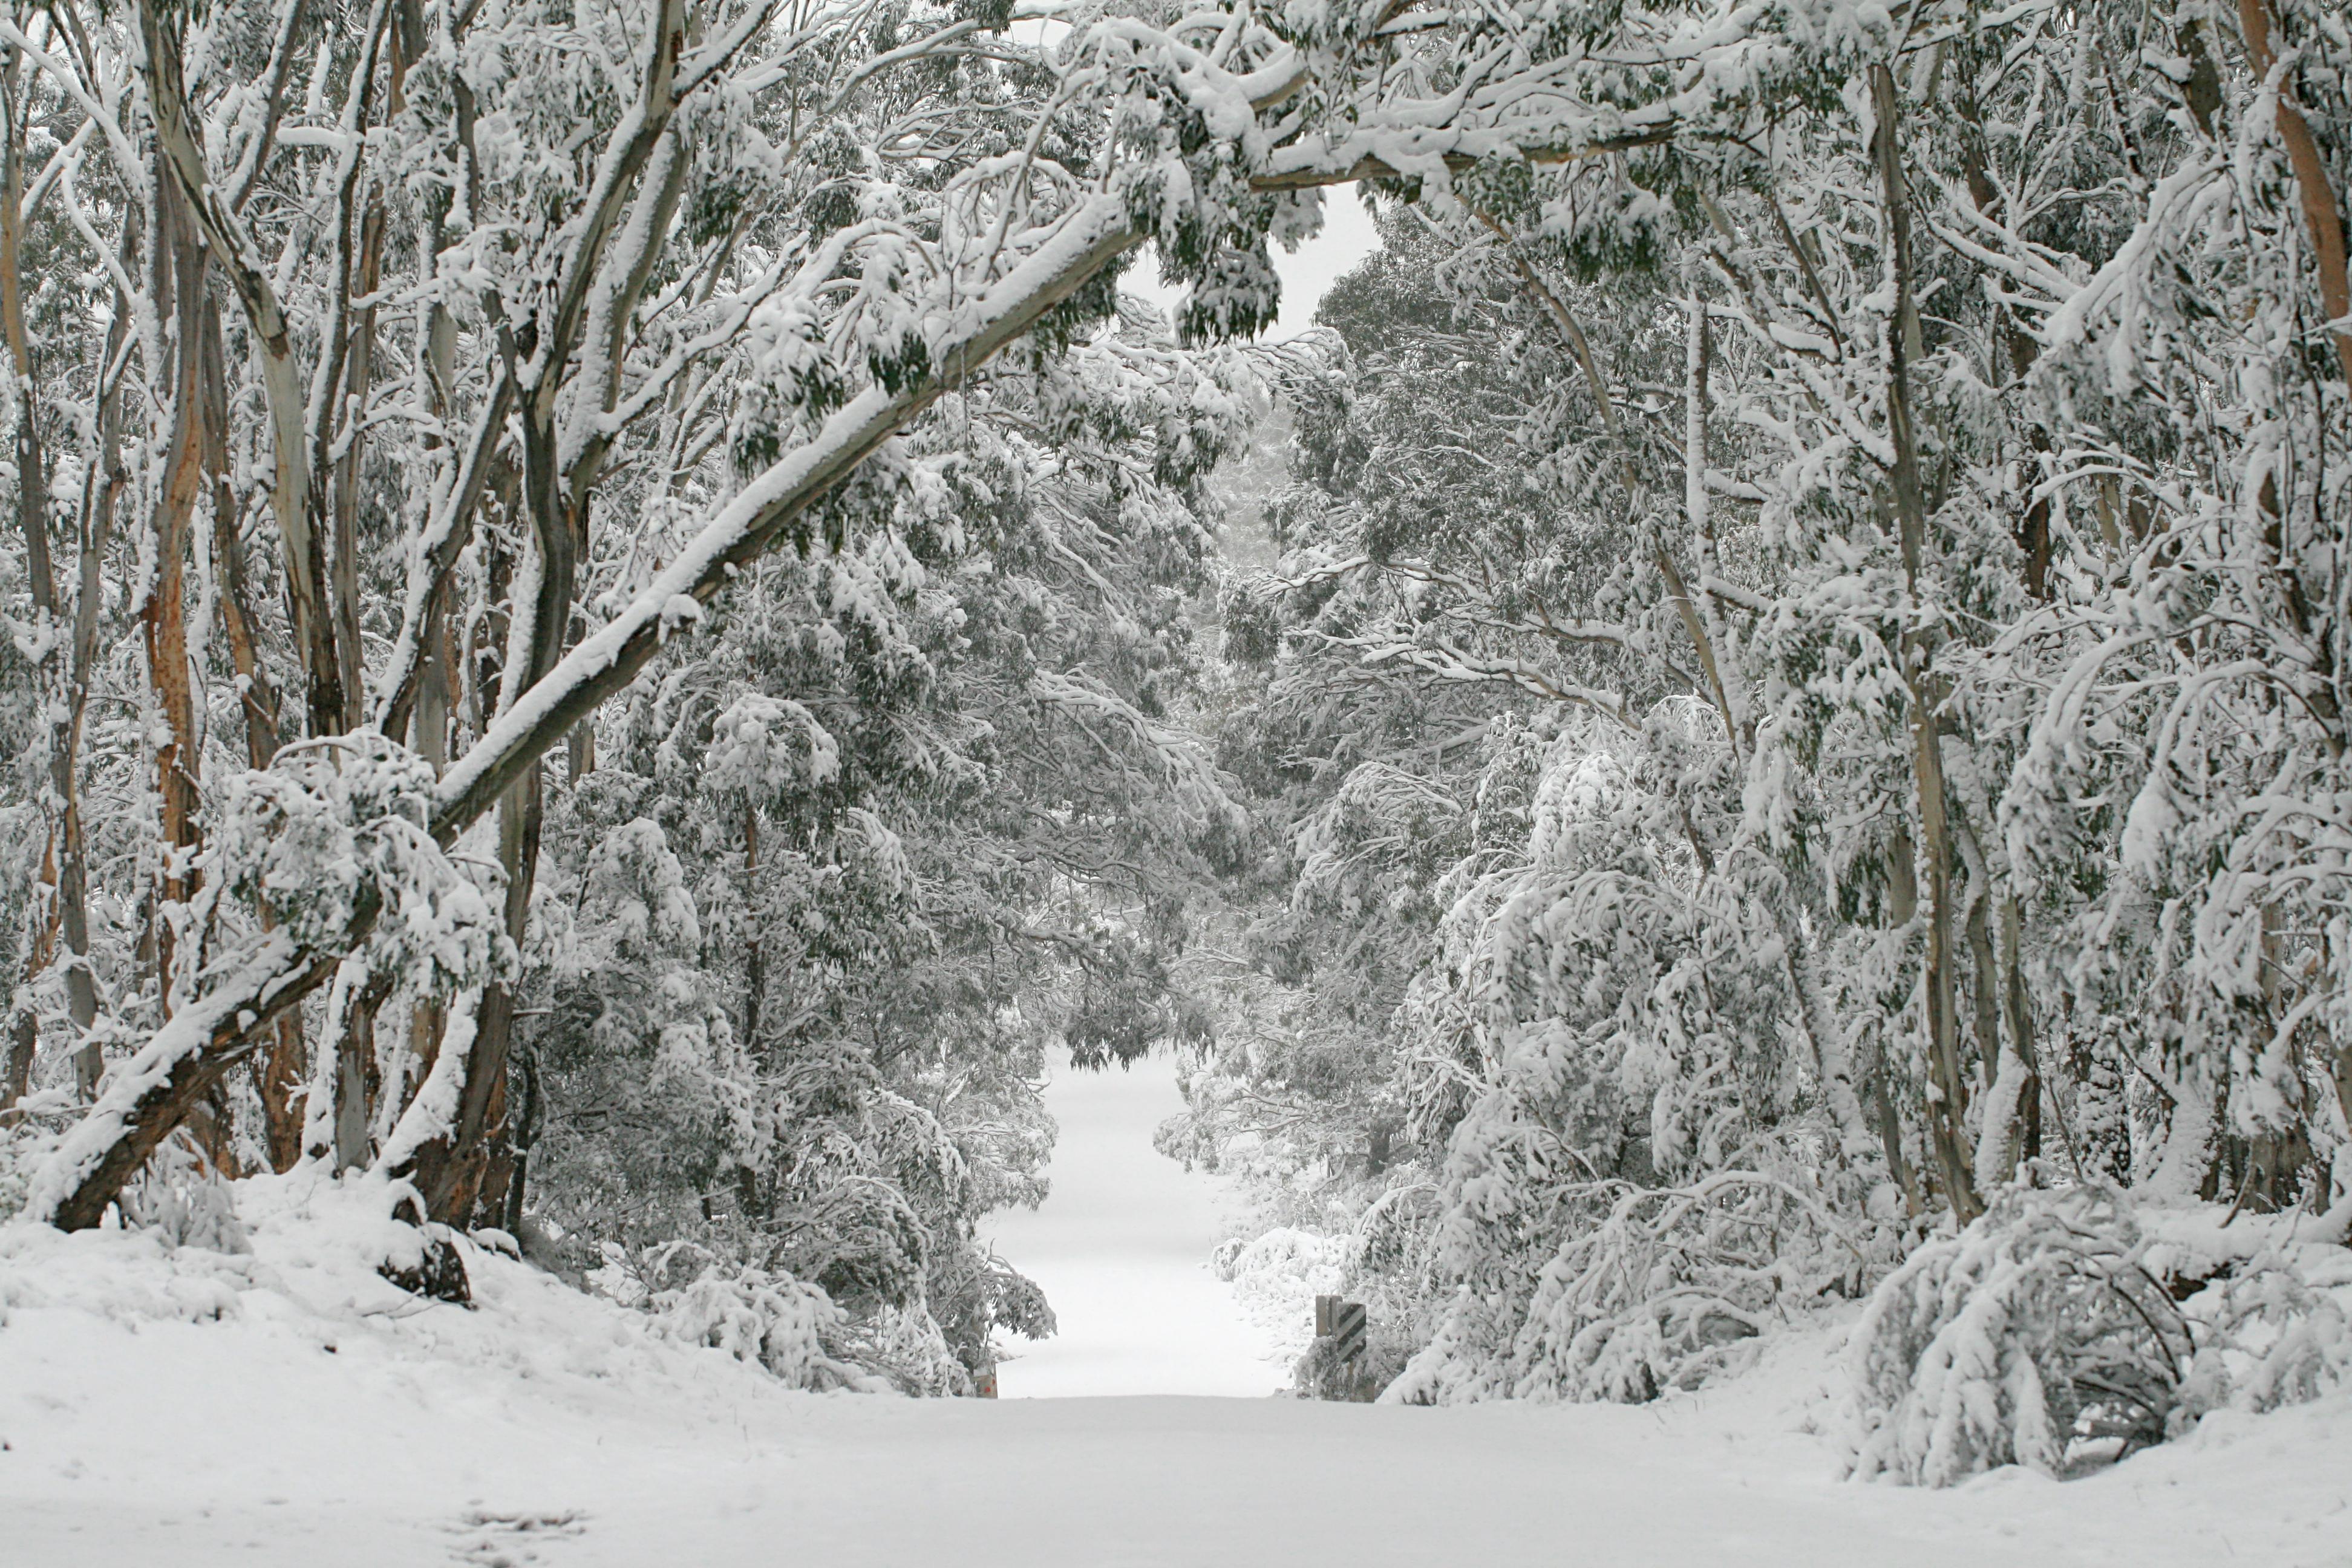 File:Kanangra winter wonderland.jpg